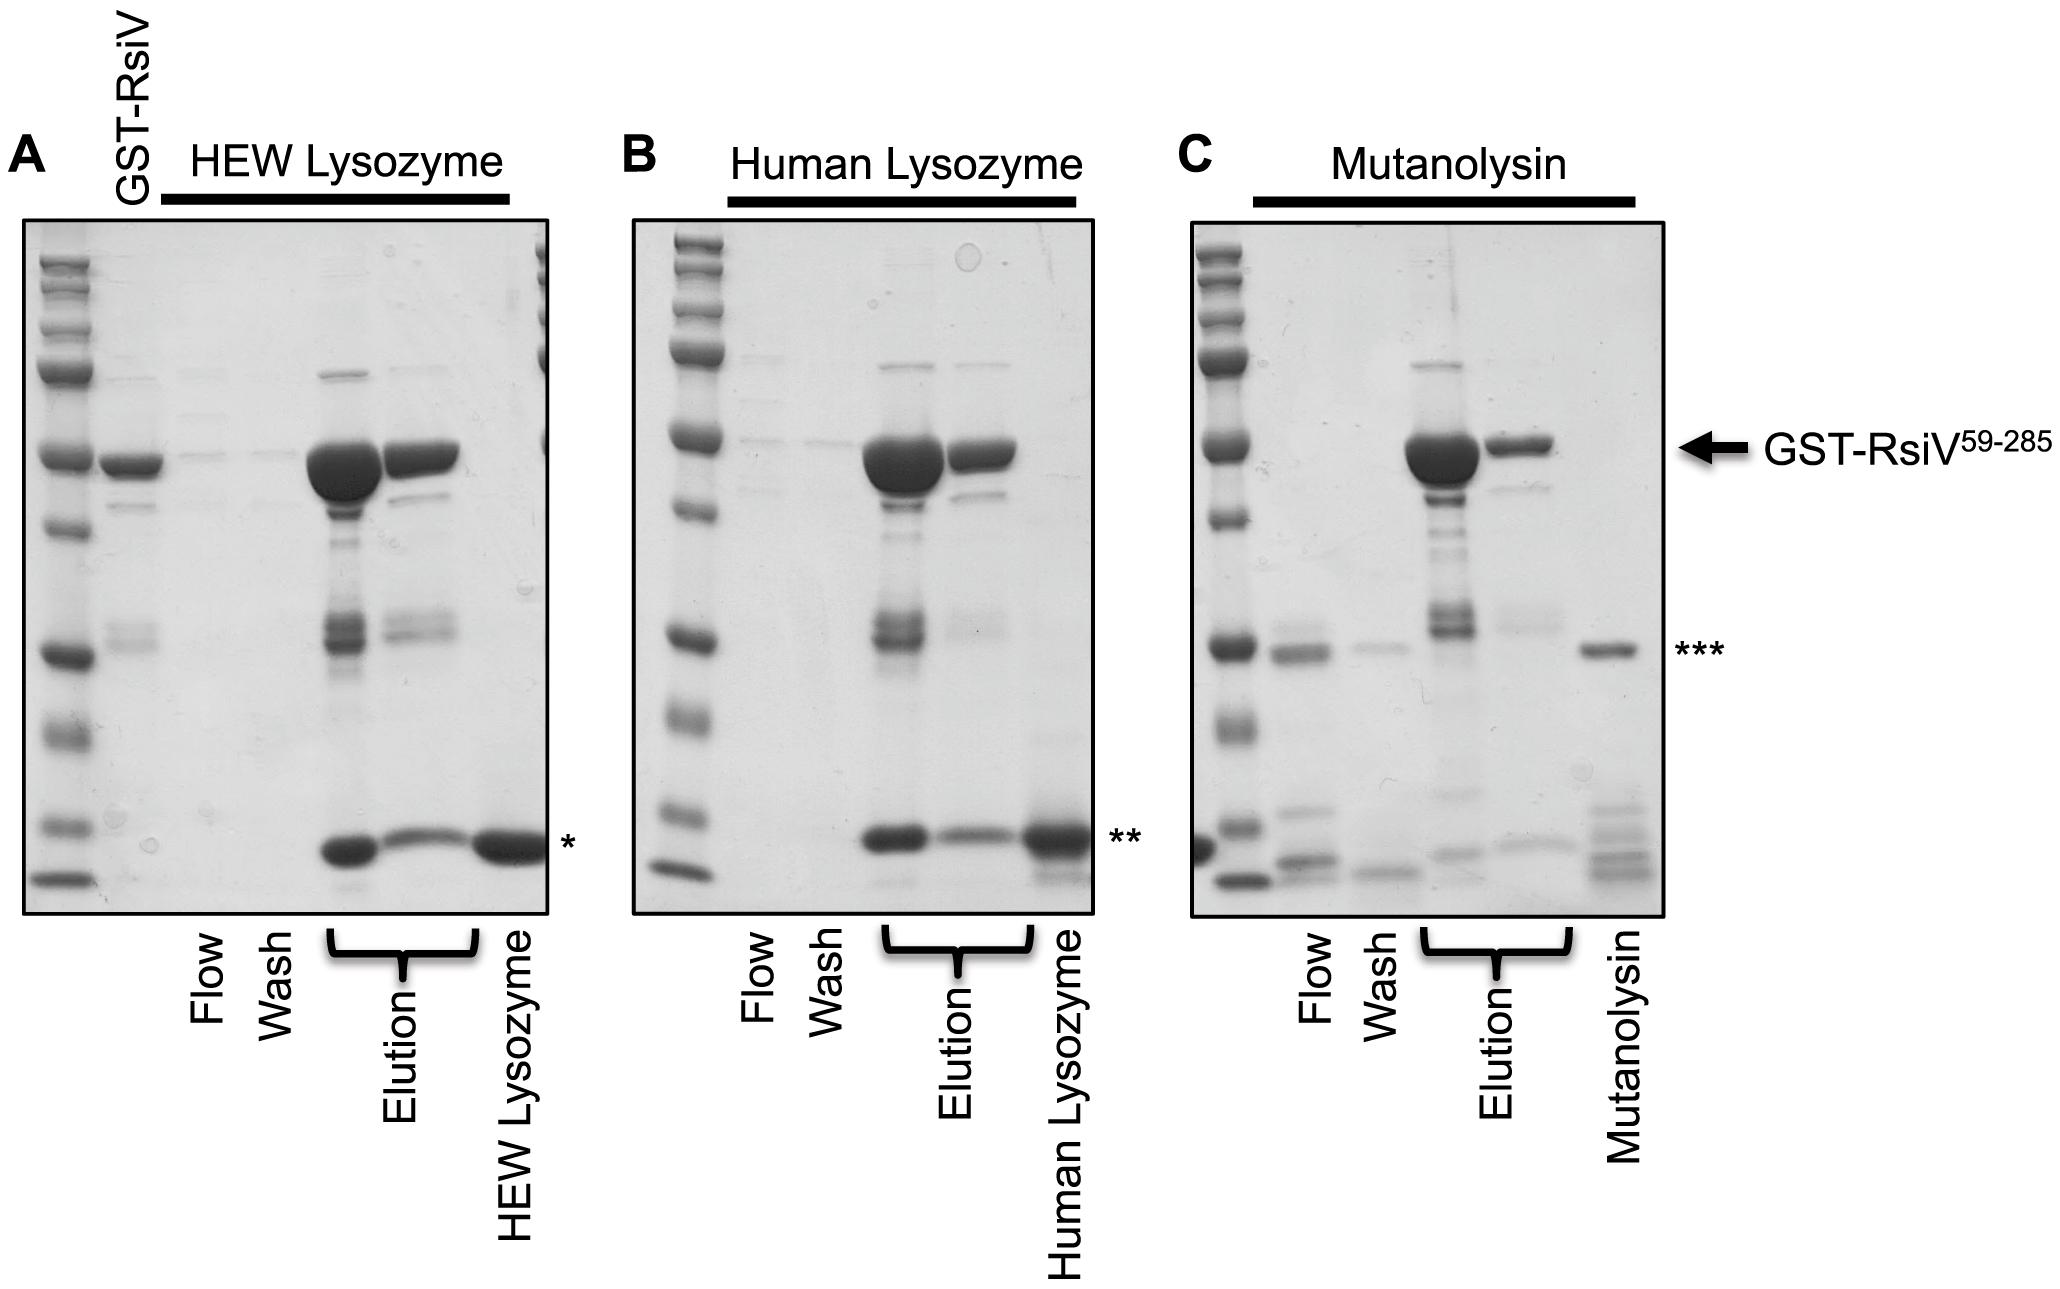 RsiV binds C-type lysozyme but not mutanolysin.